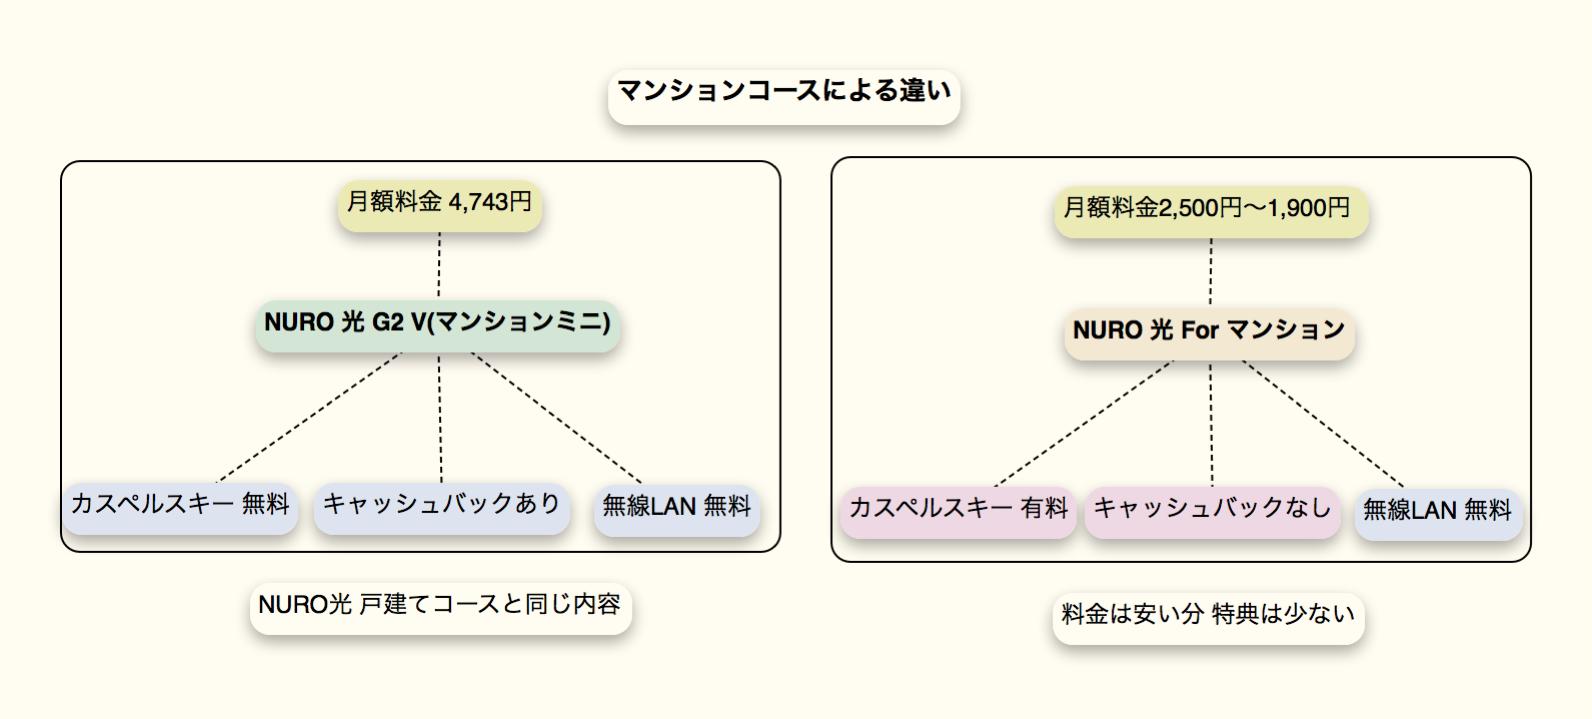 NURO光 マンションコースの特典違い (クリックで拡大)